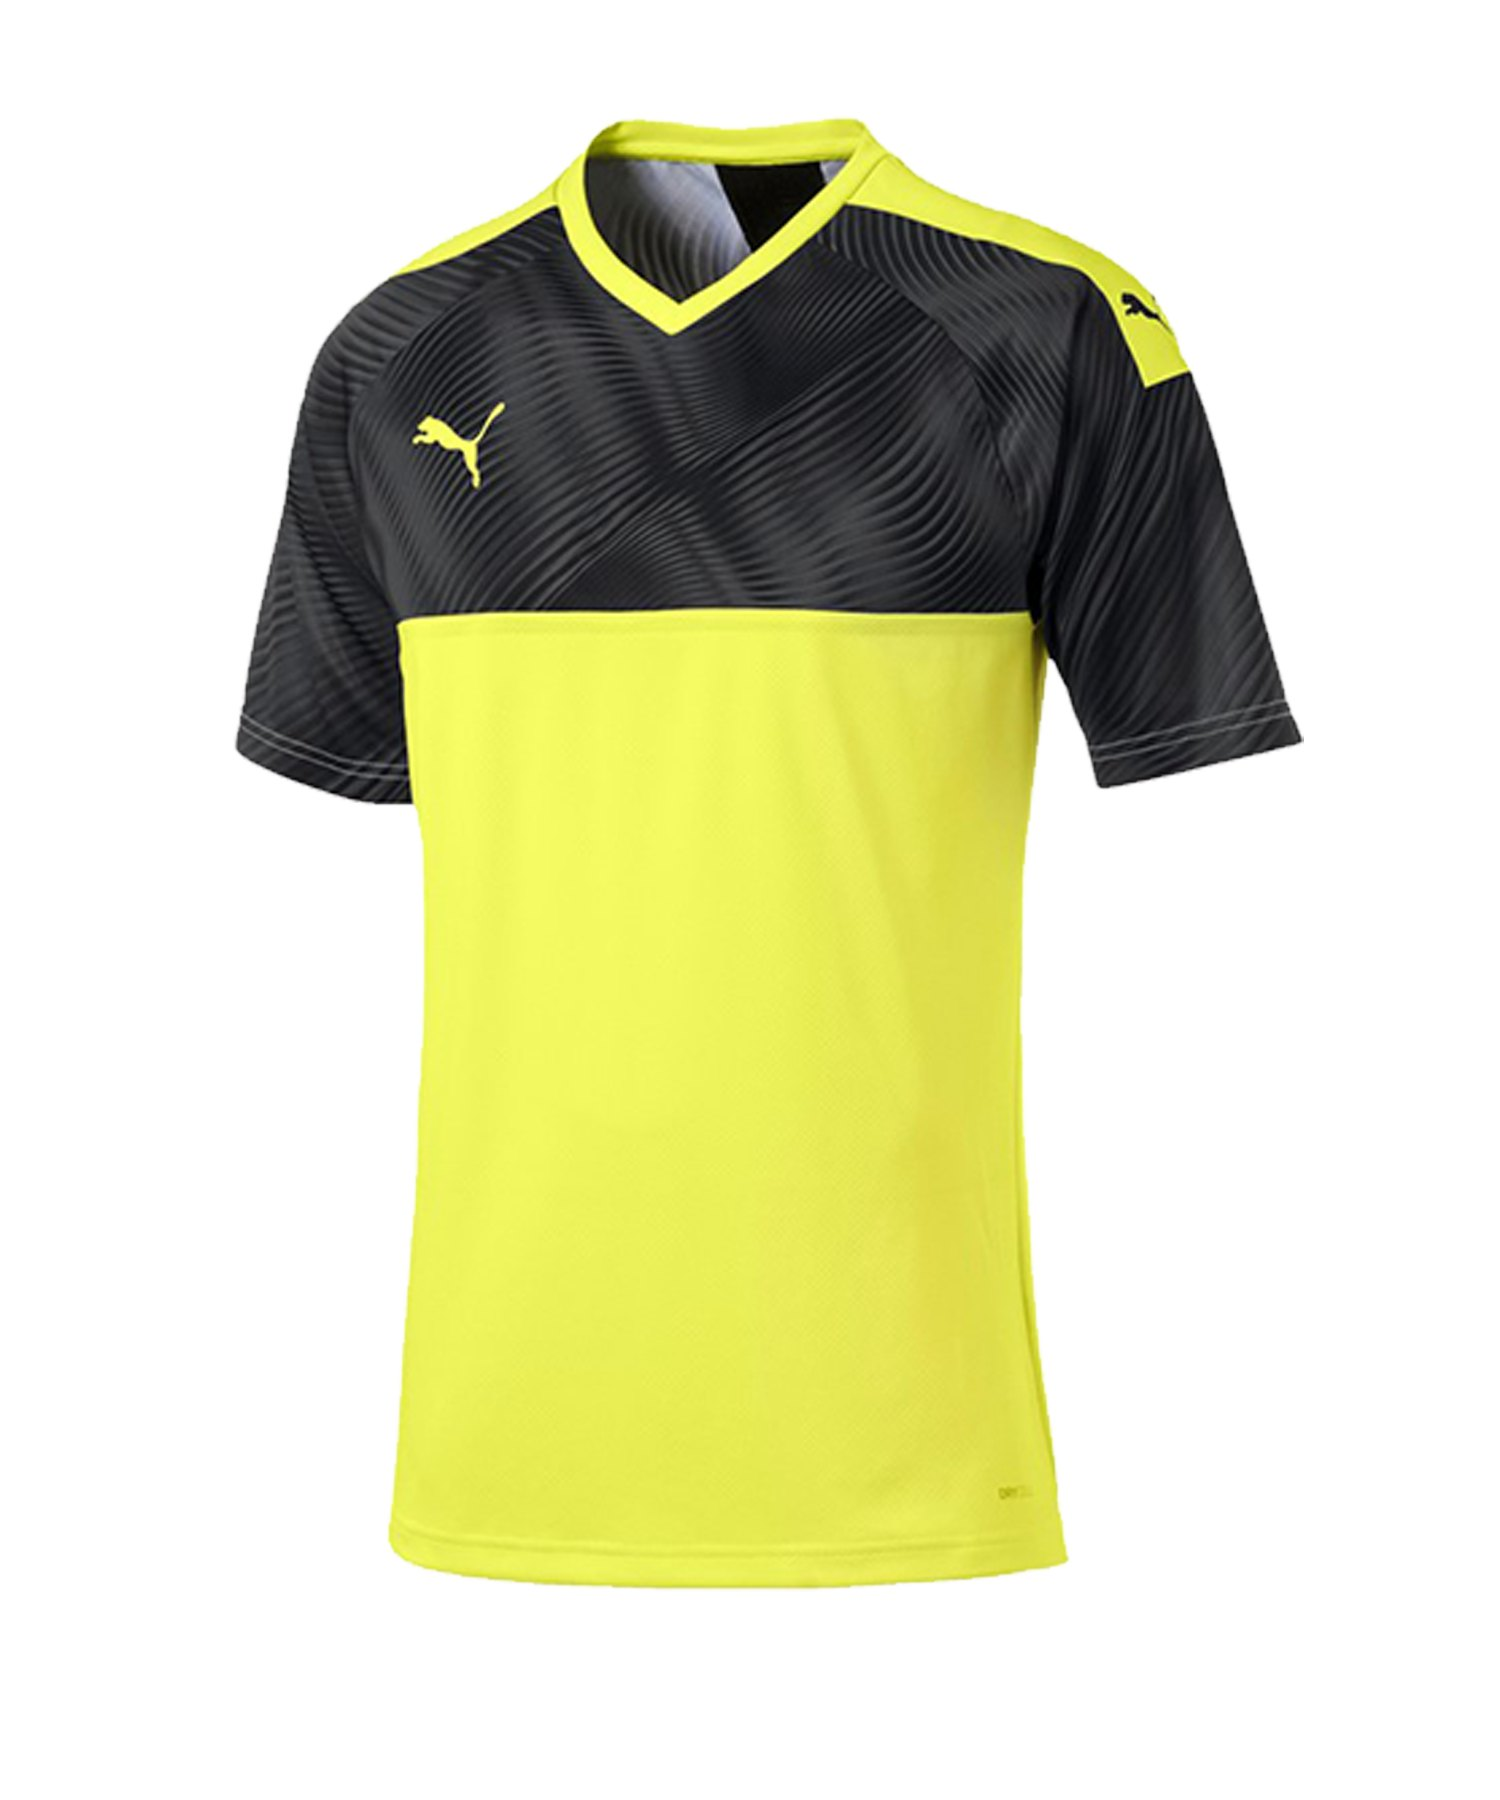 PUMA CUP Jersey Trikot kurzarm Gelb Schwarz F46 - gelb